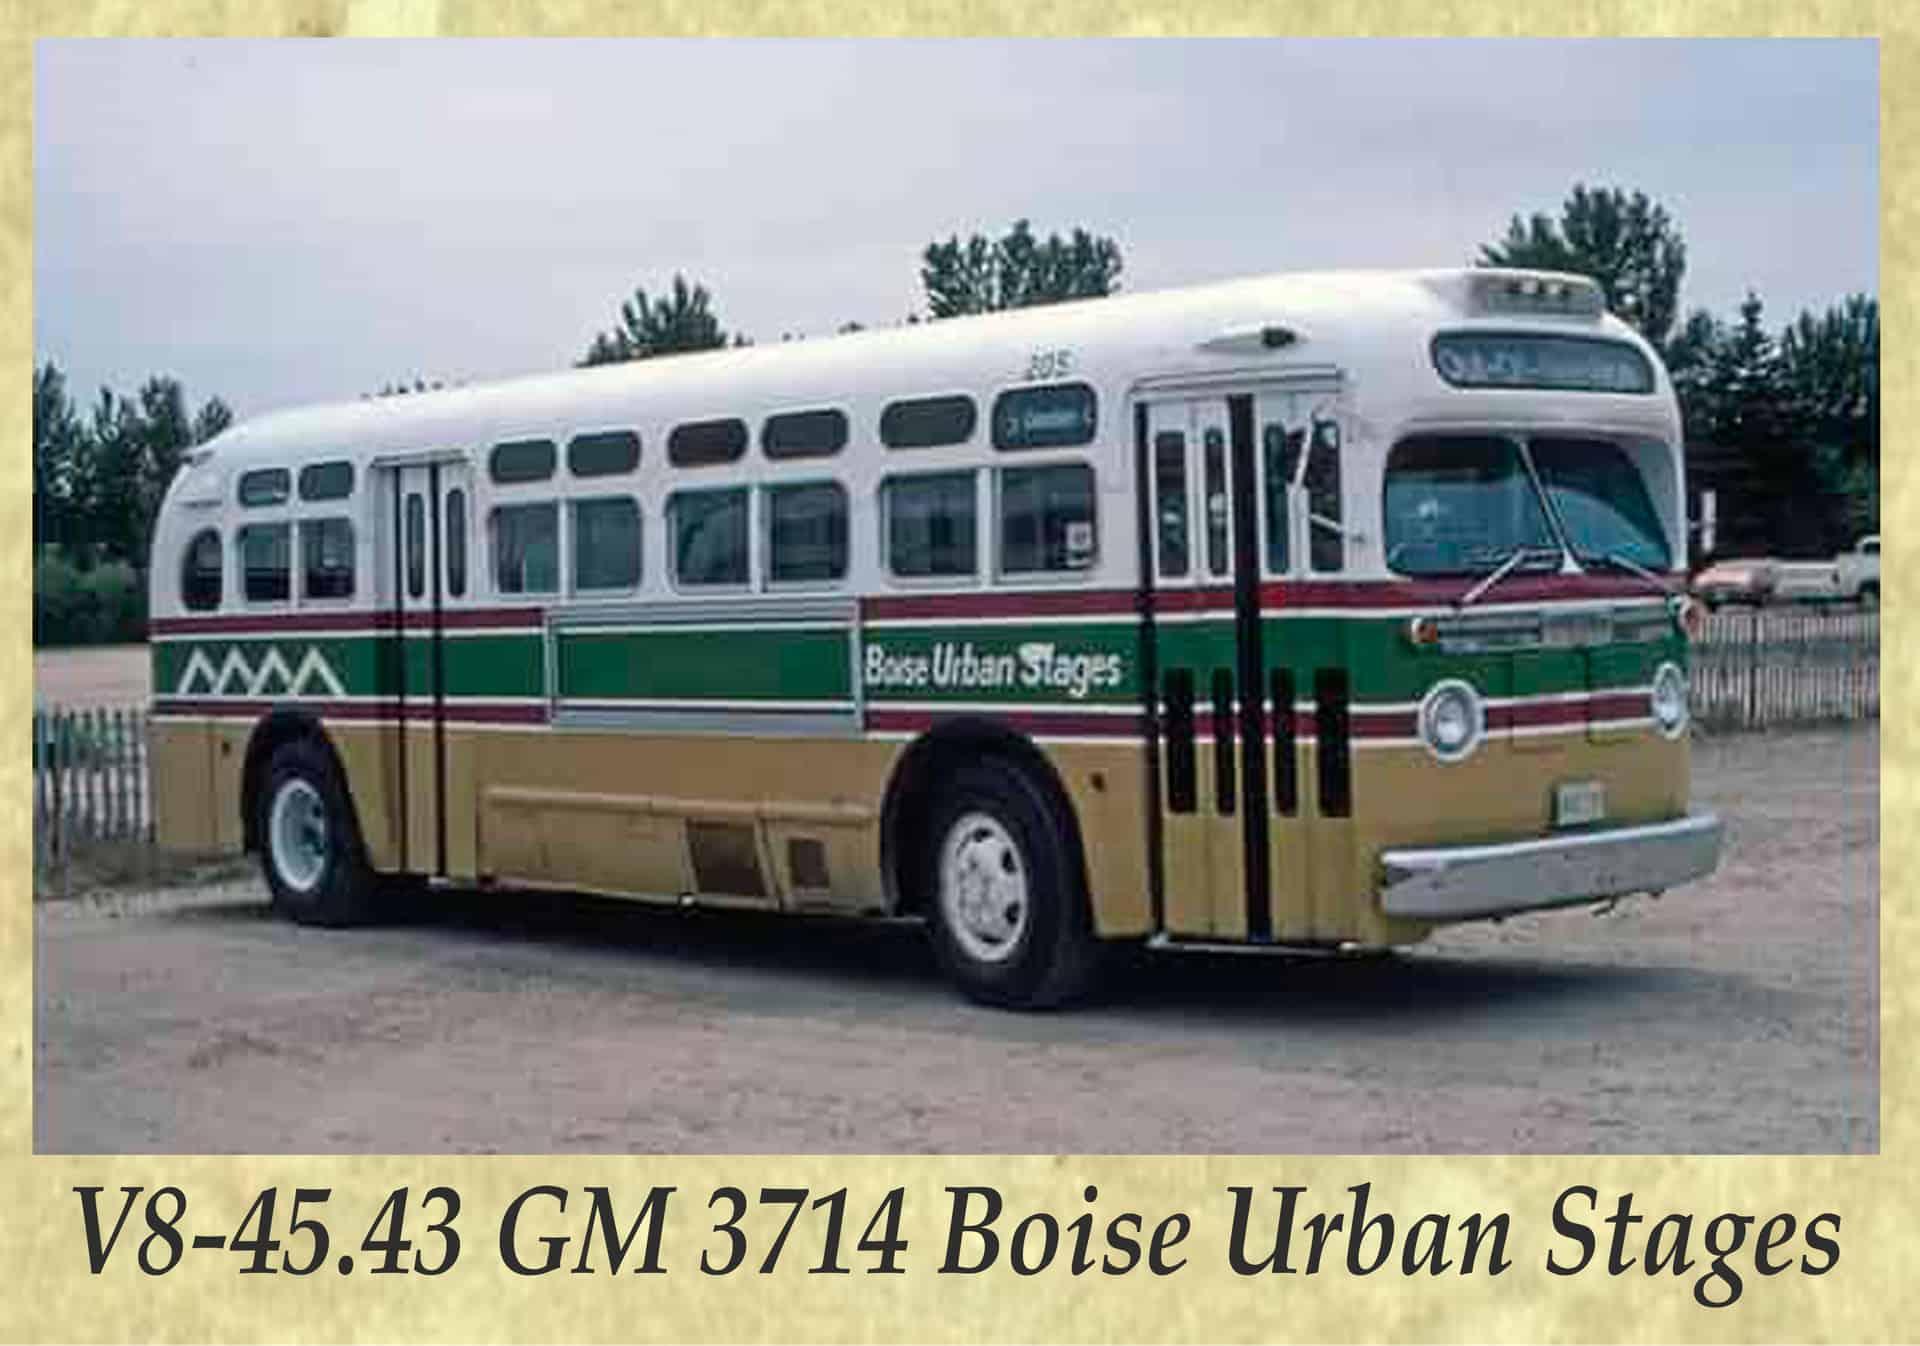 V8-45.43 GM 3714 Boise Urban Stages